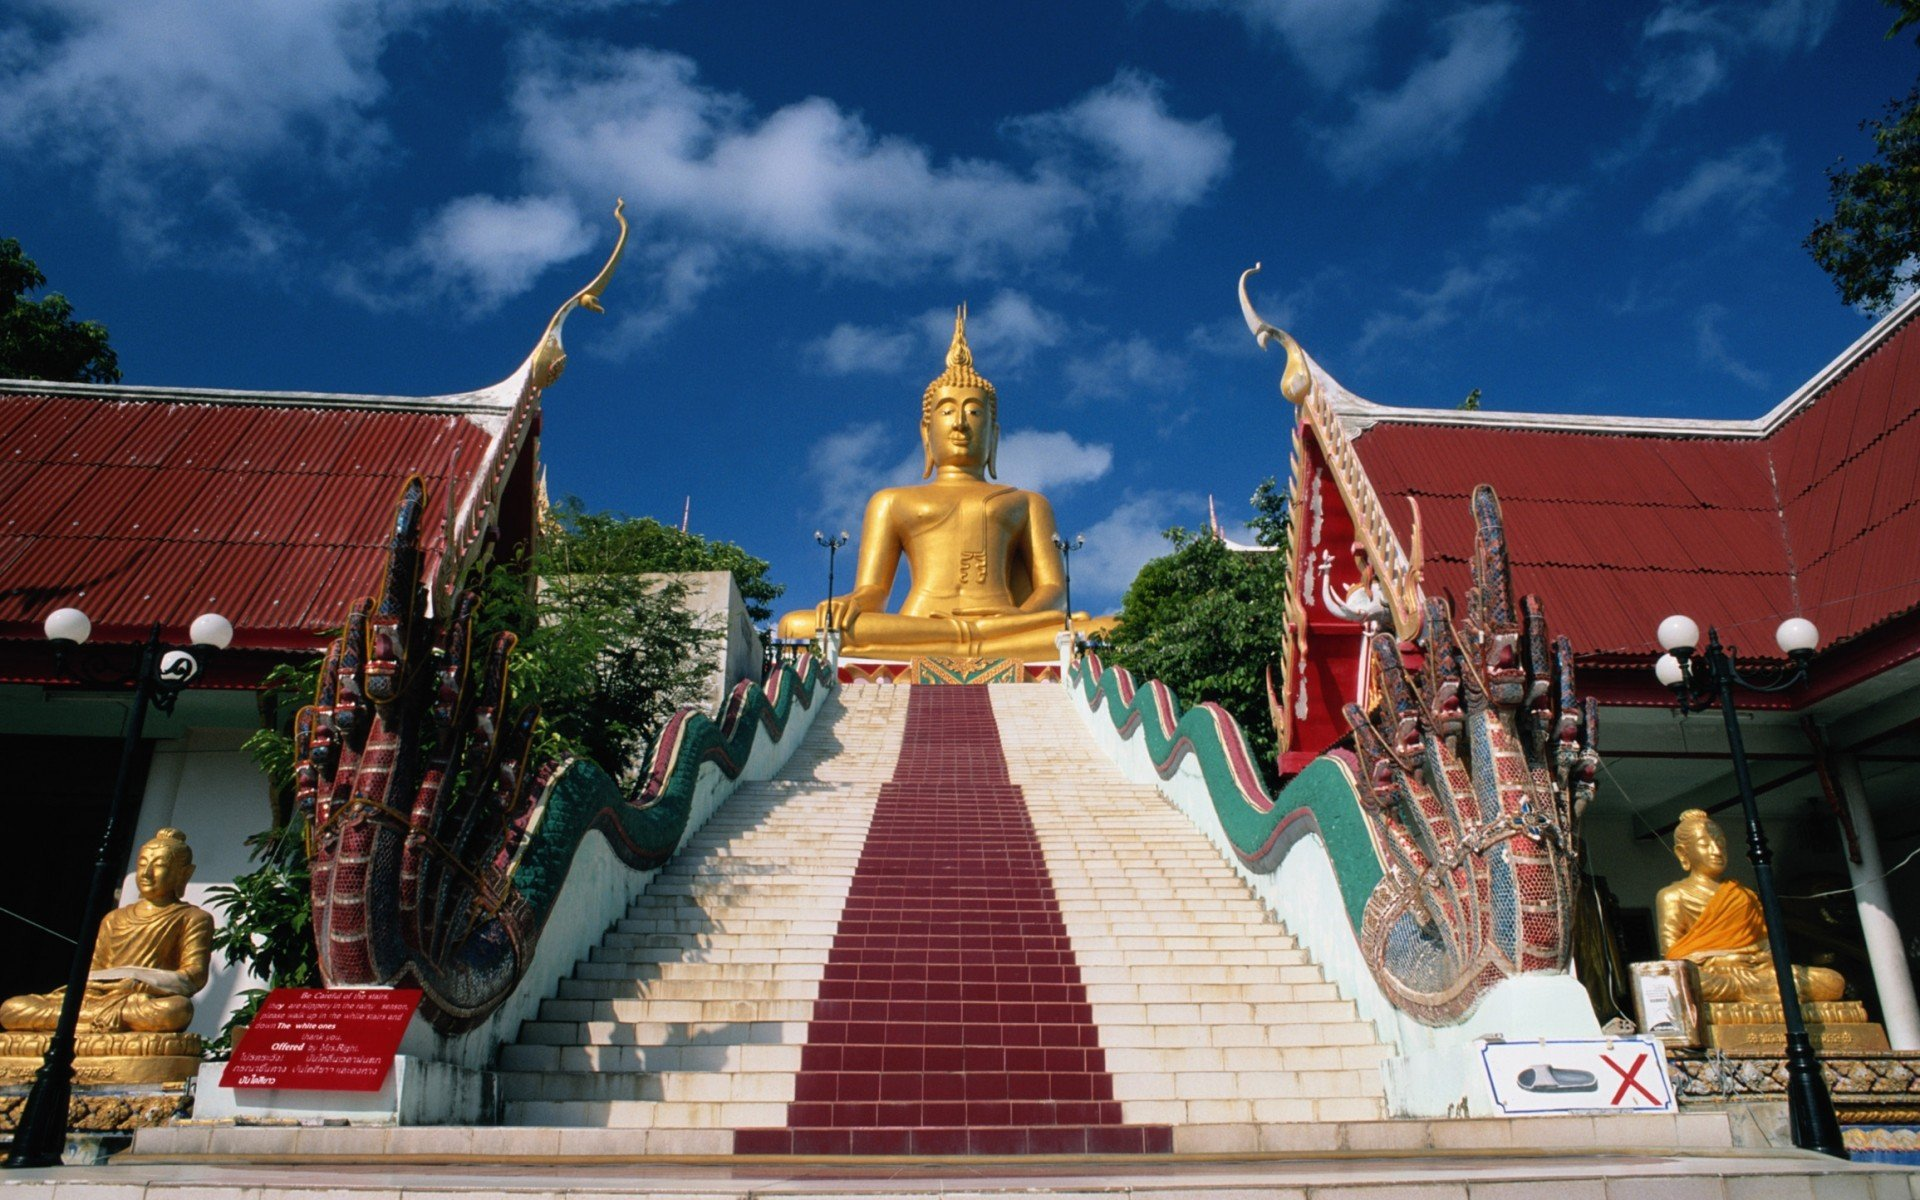 Stairways Religion Naga Buddha Thailand Temples Wallpaper